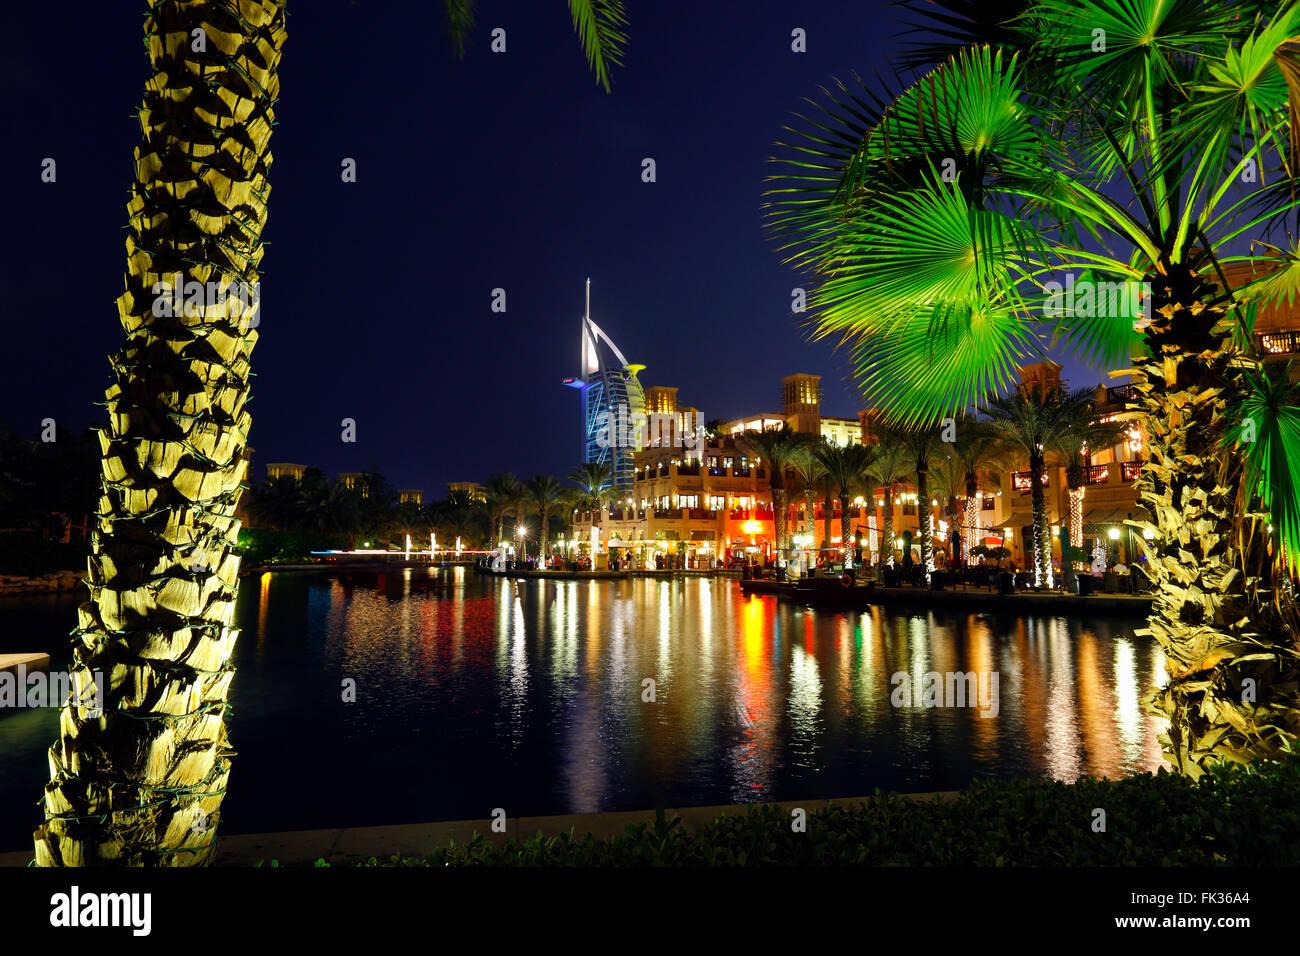 Burj Al Arab hotel & Souk Madinat Jumeirh Dubai, United Arab Emirates - Stock Image